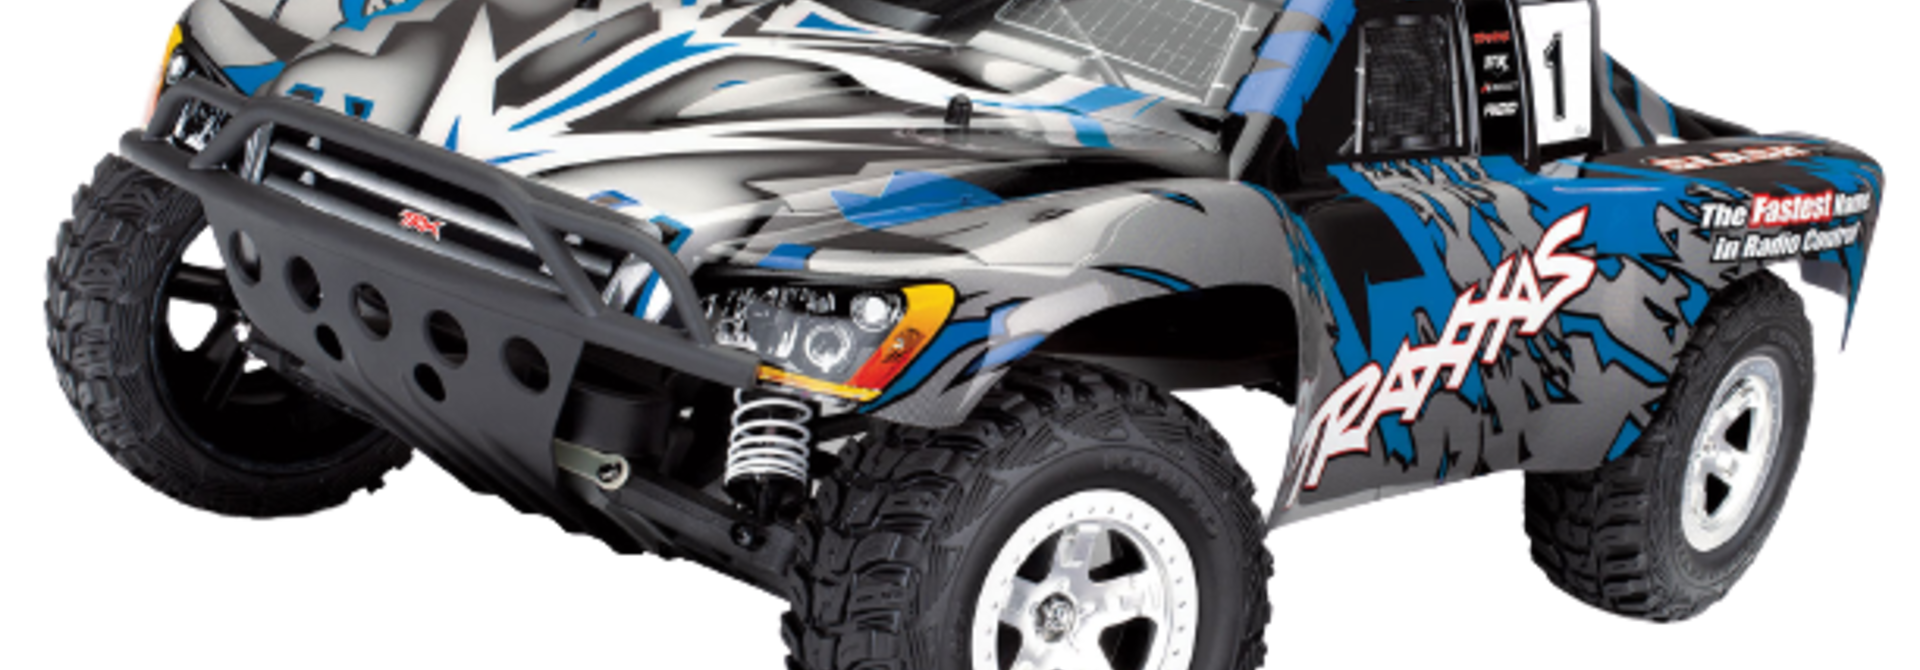 Traxxas Slash 2WD XL-5 TQ (no battery/charger), Blue, TRX58024-B